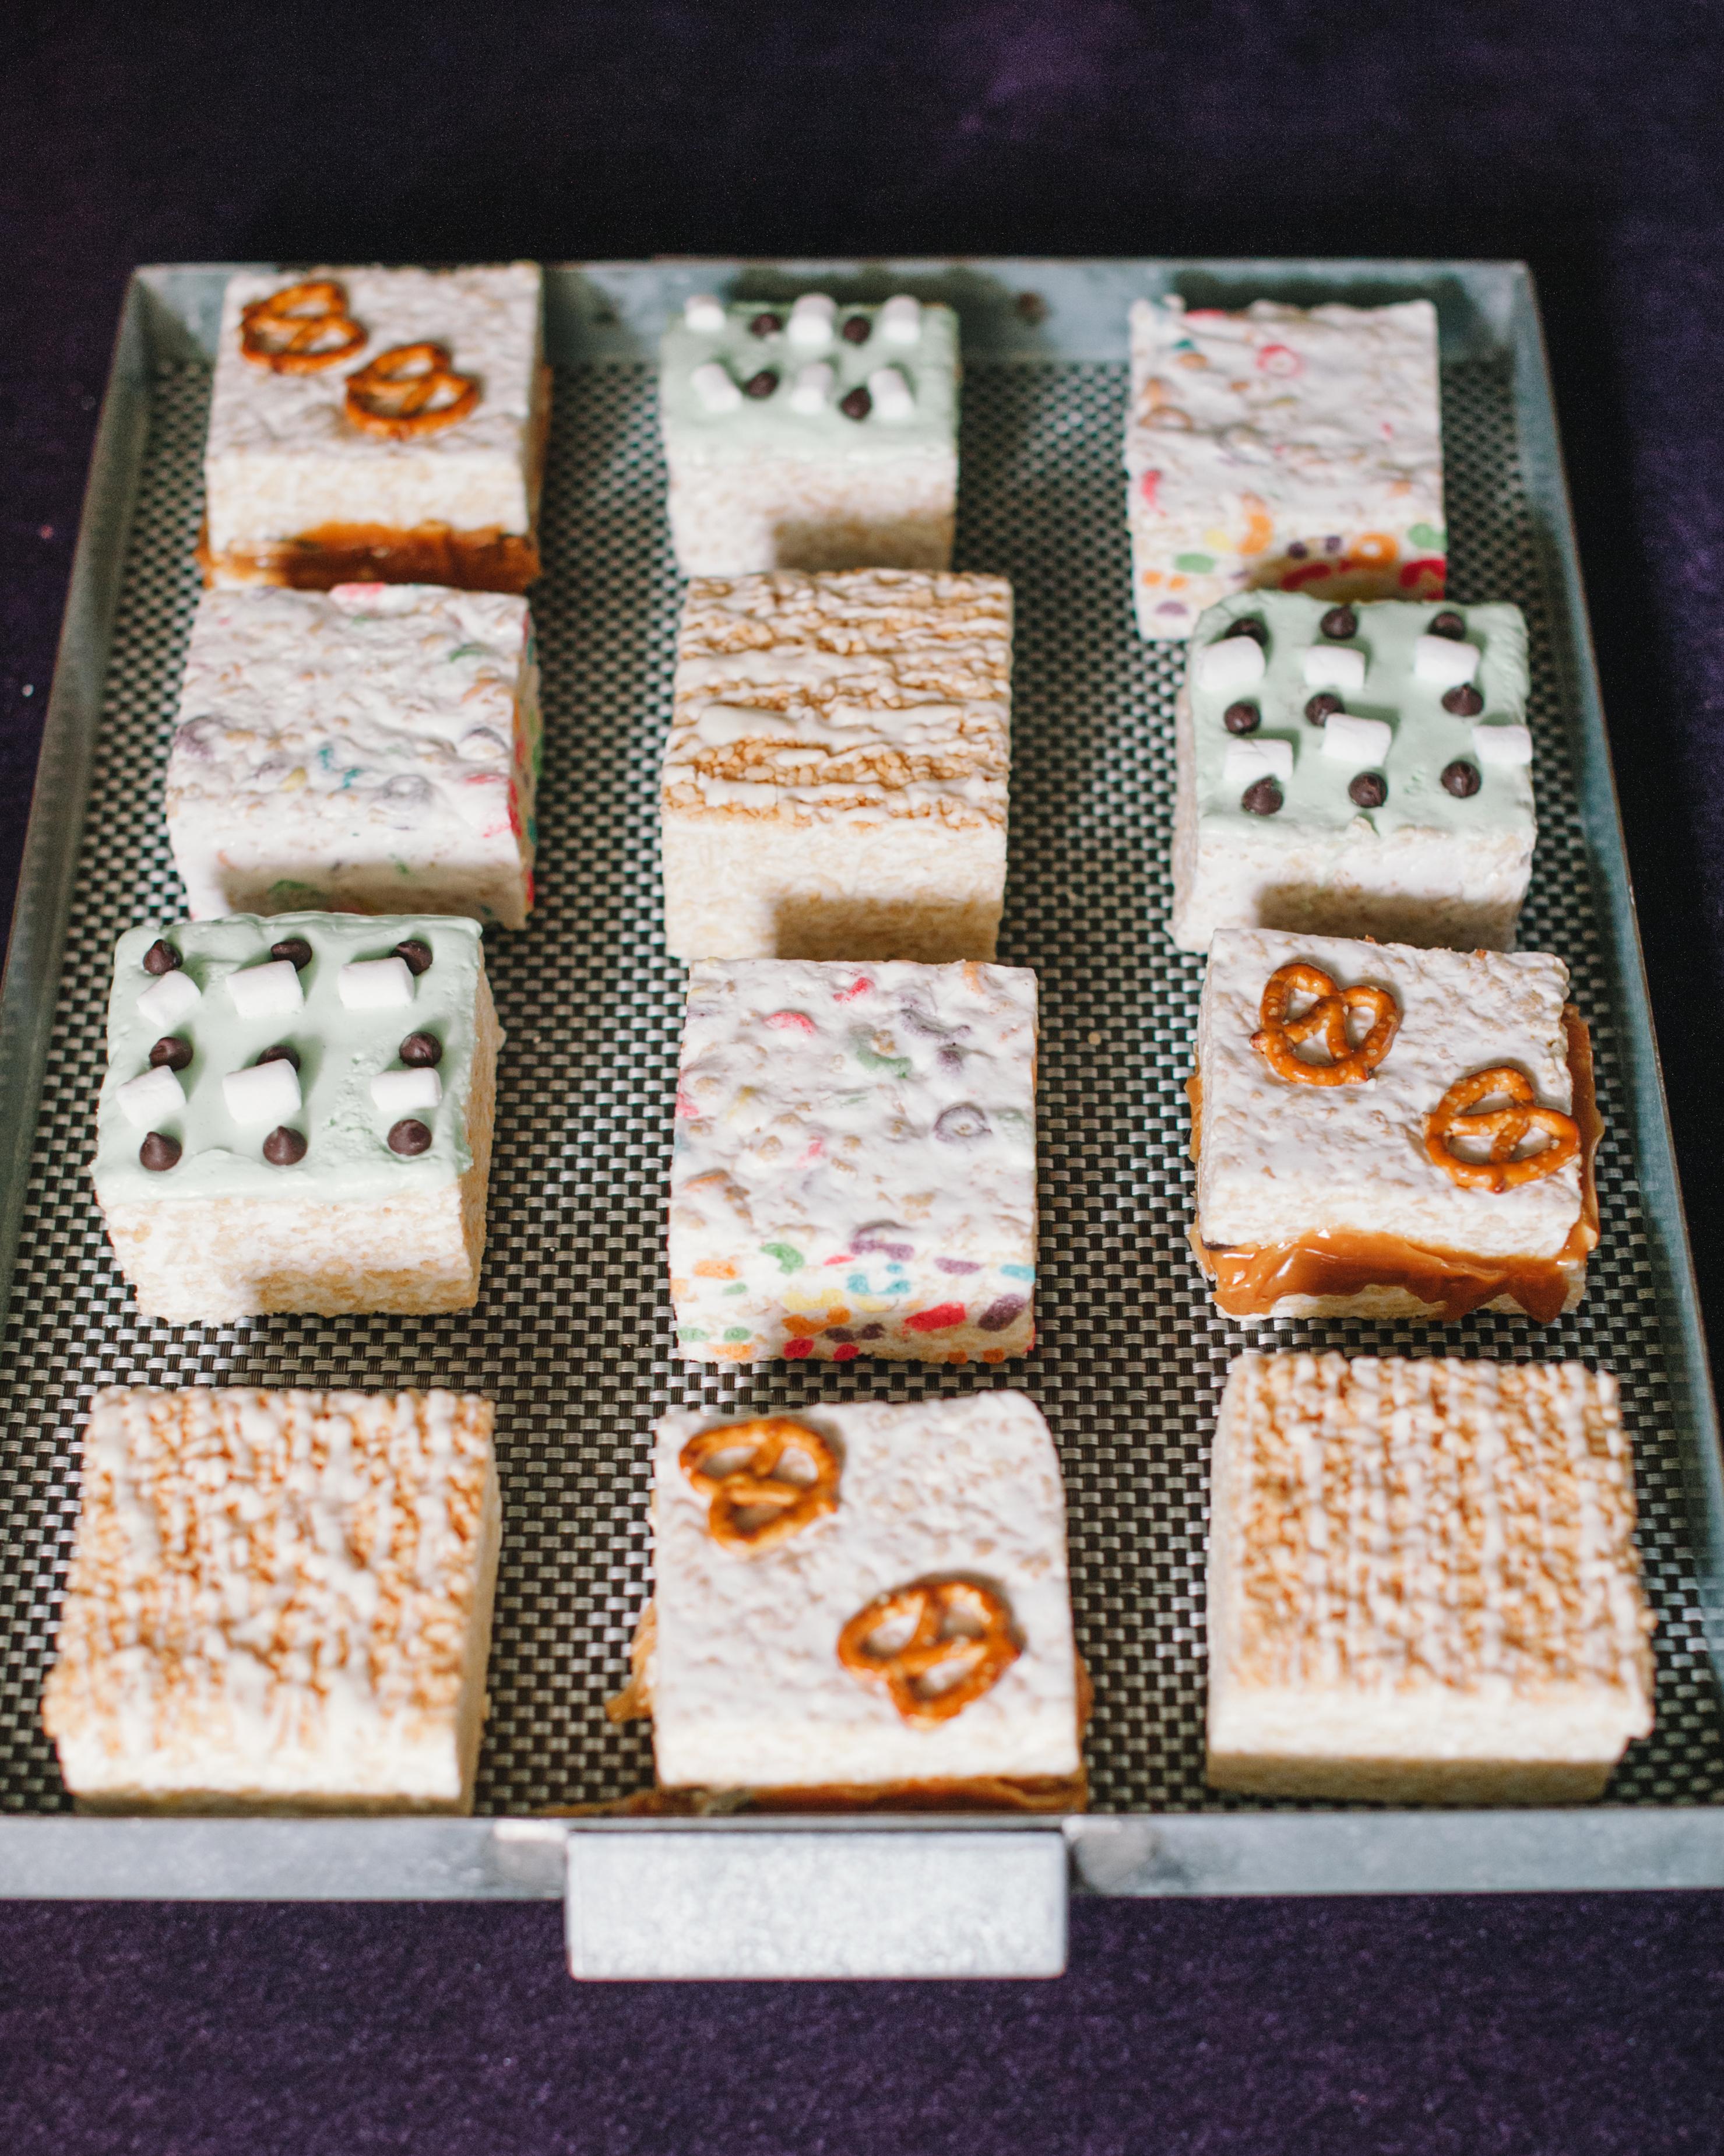 vanessa-joe-wedding-treats-10127-s111736-1214.jpg